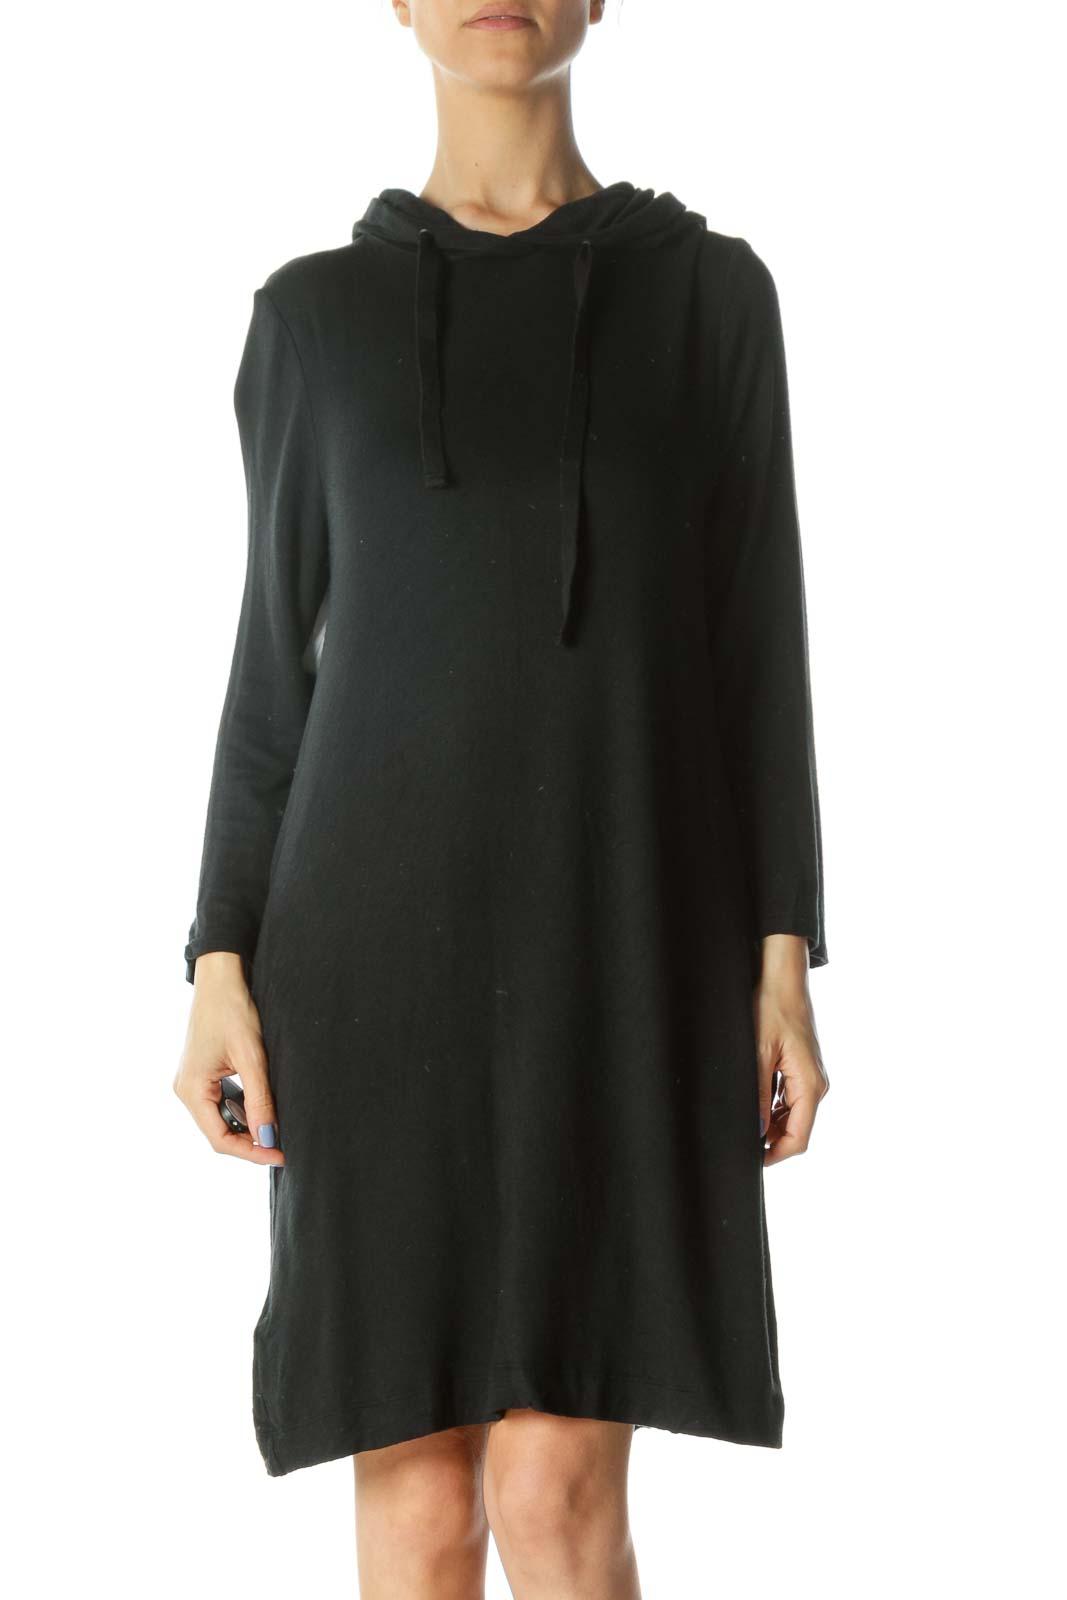 Black Hooded 3/4-Sleeve Soft Jersey-Knit Dress Front